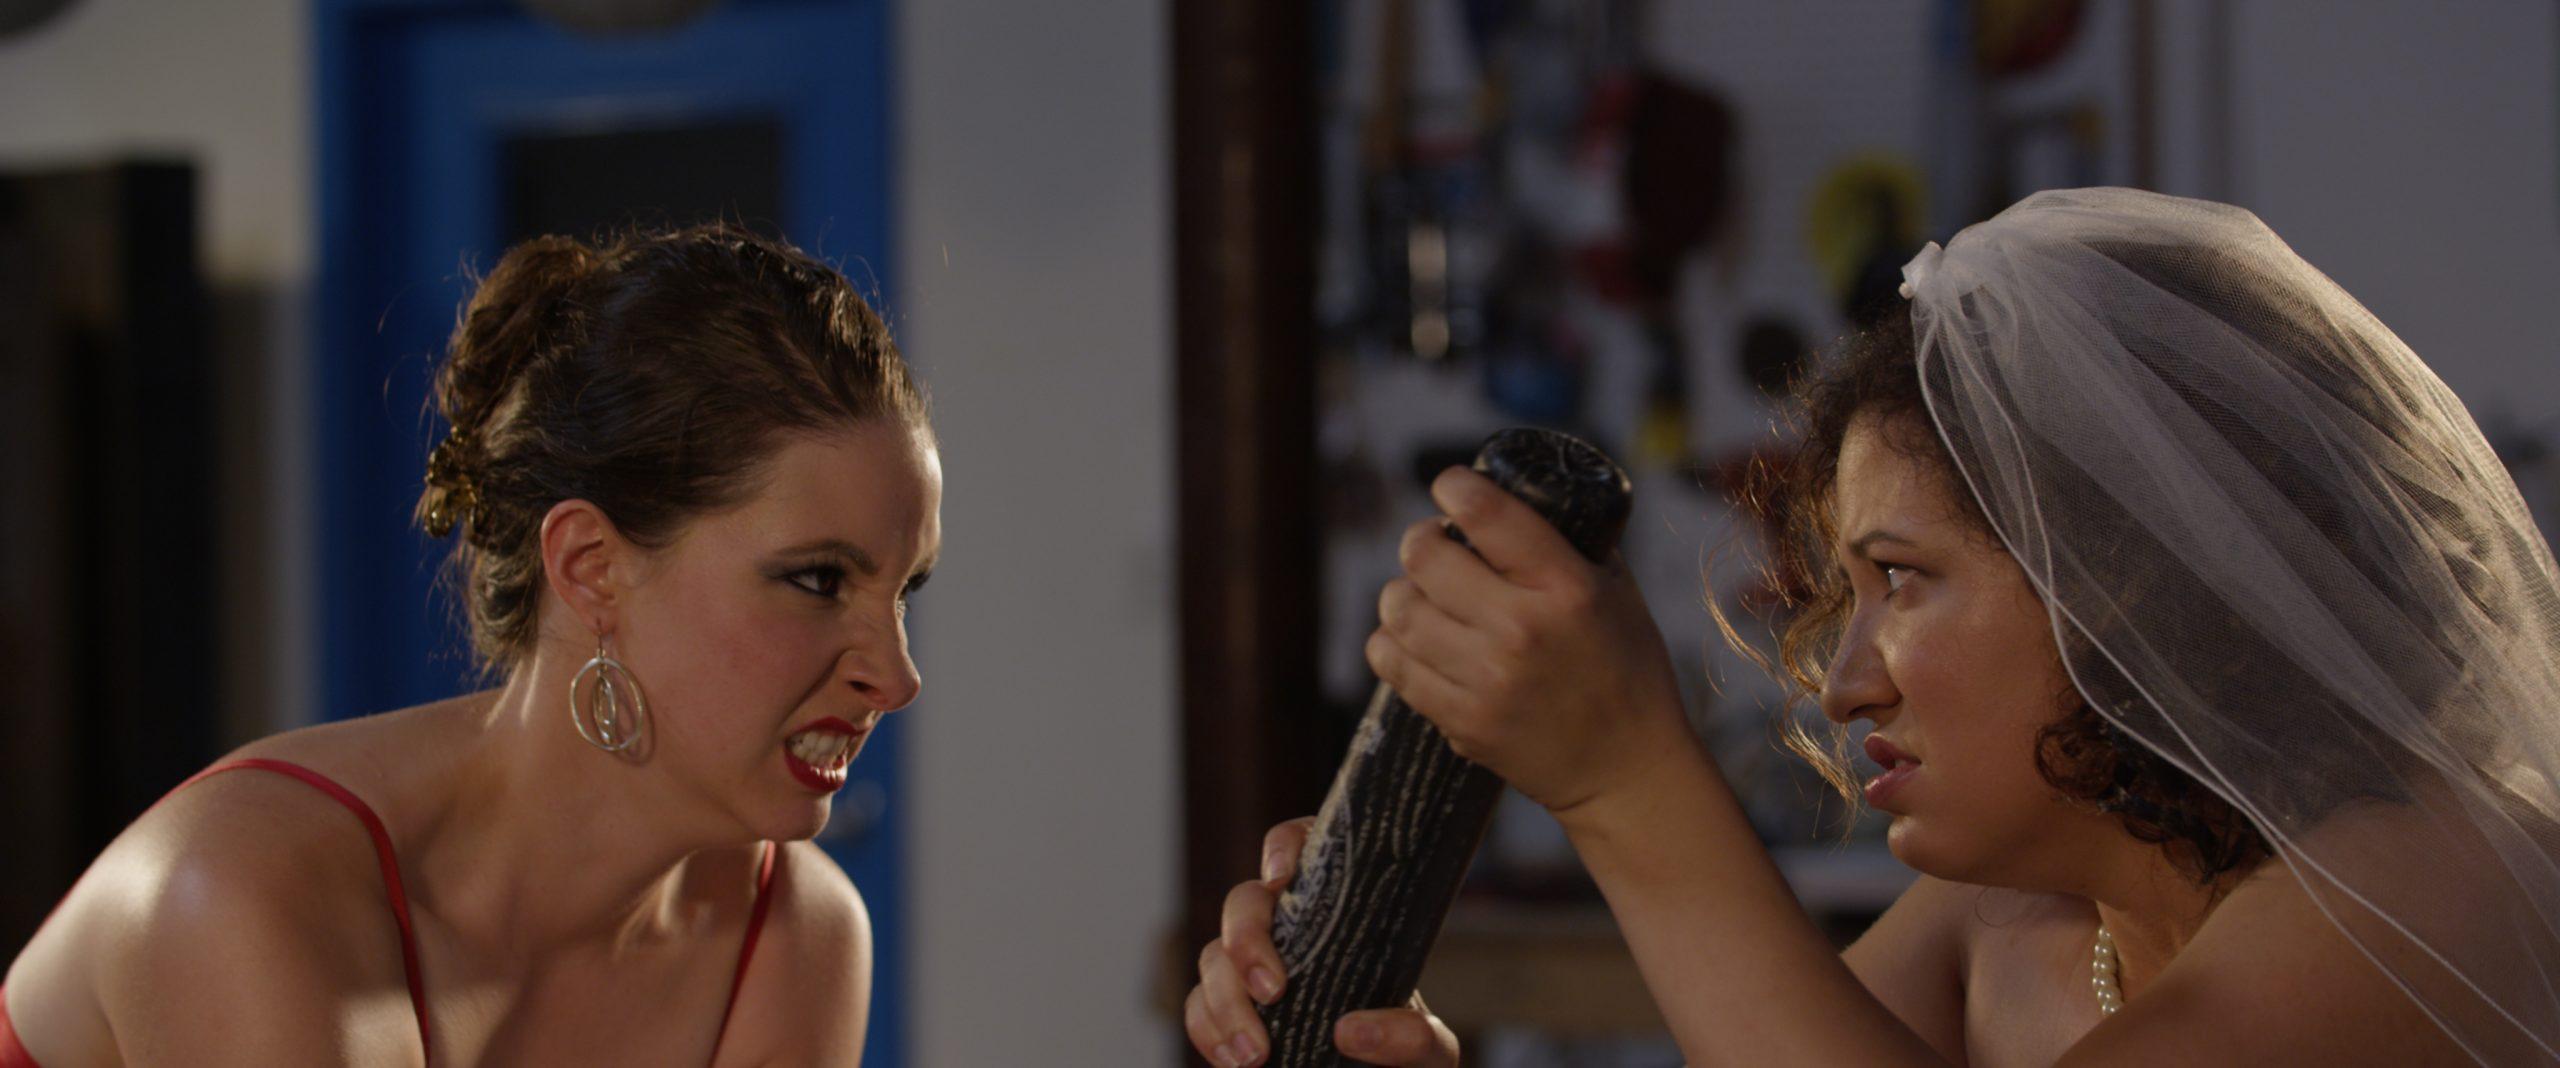 Still photo of Lani (Lexi Balestrieri) and Eve (Yvelisse Cedrez)